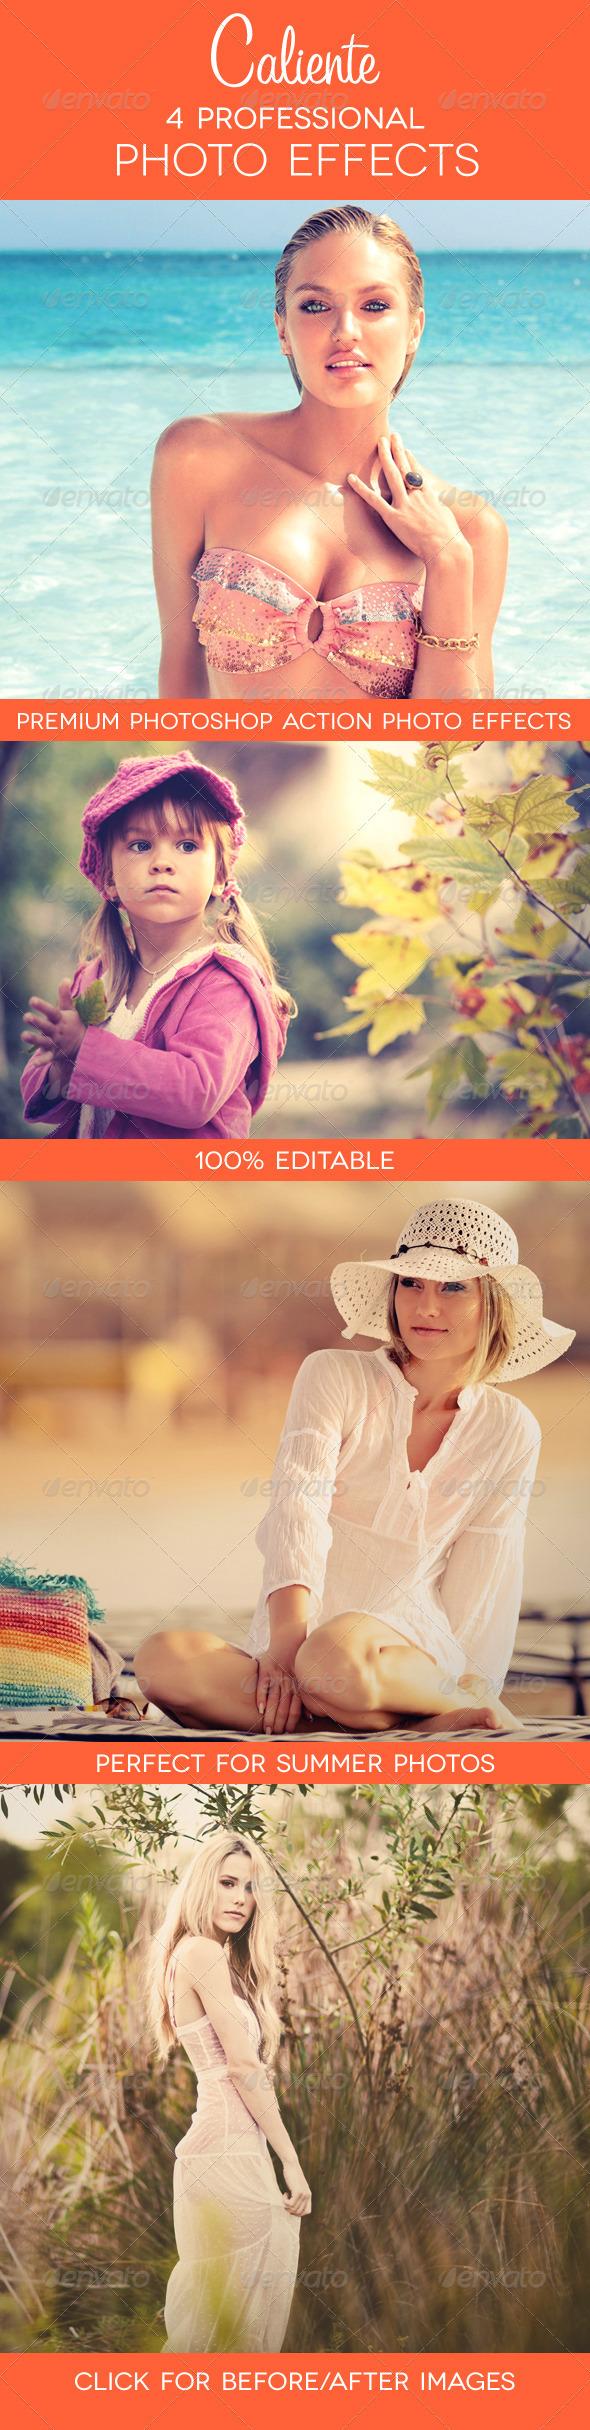 GraphicRiver Caliente 4 Premium Photo Effects 2483734